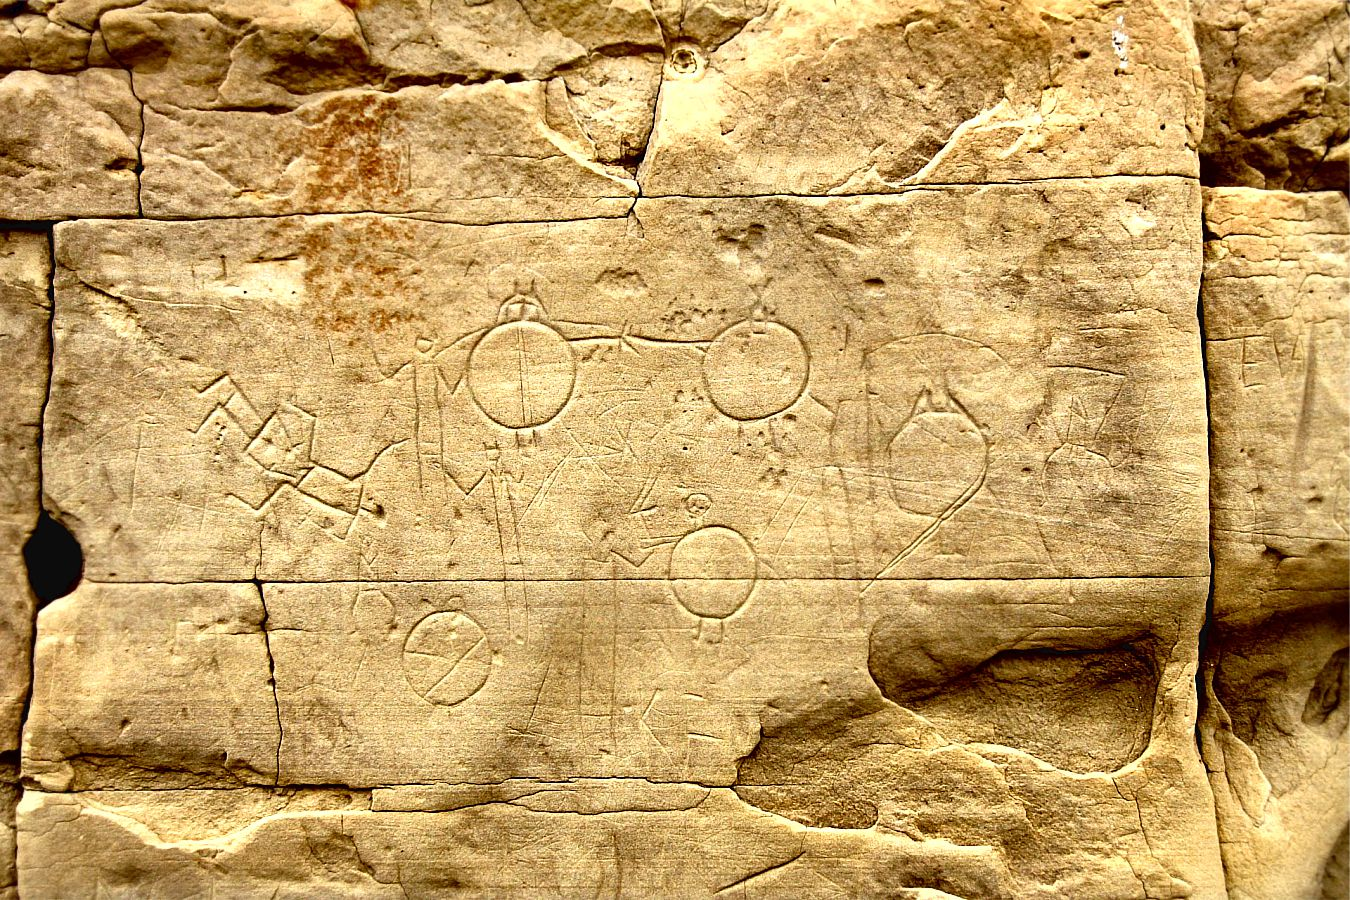 Turoe stone essay writer